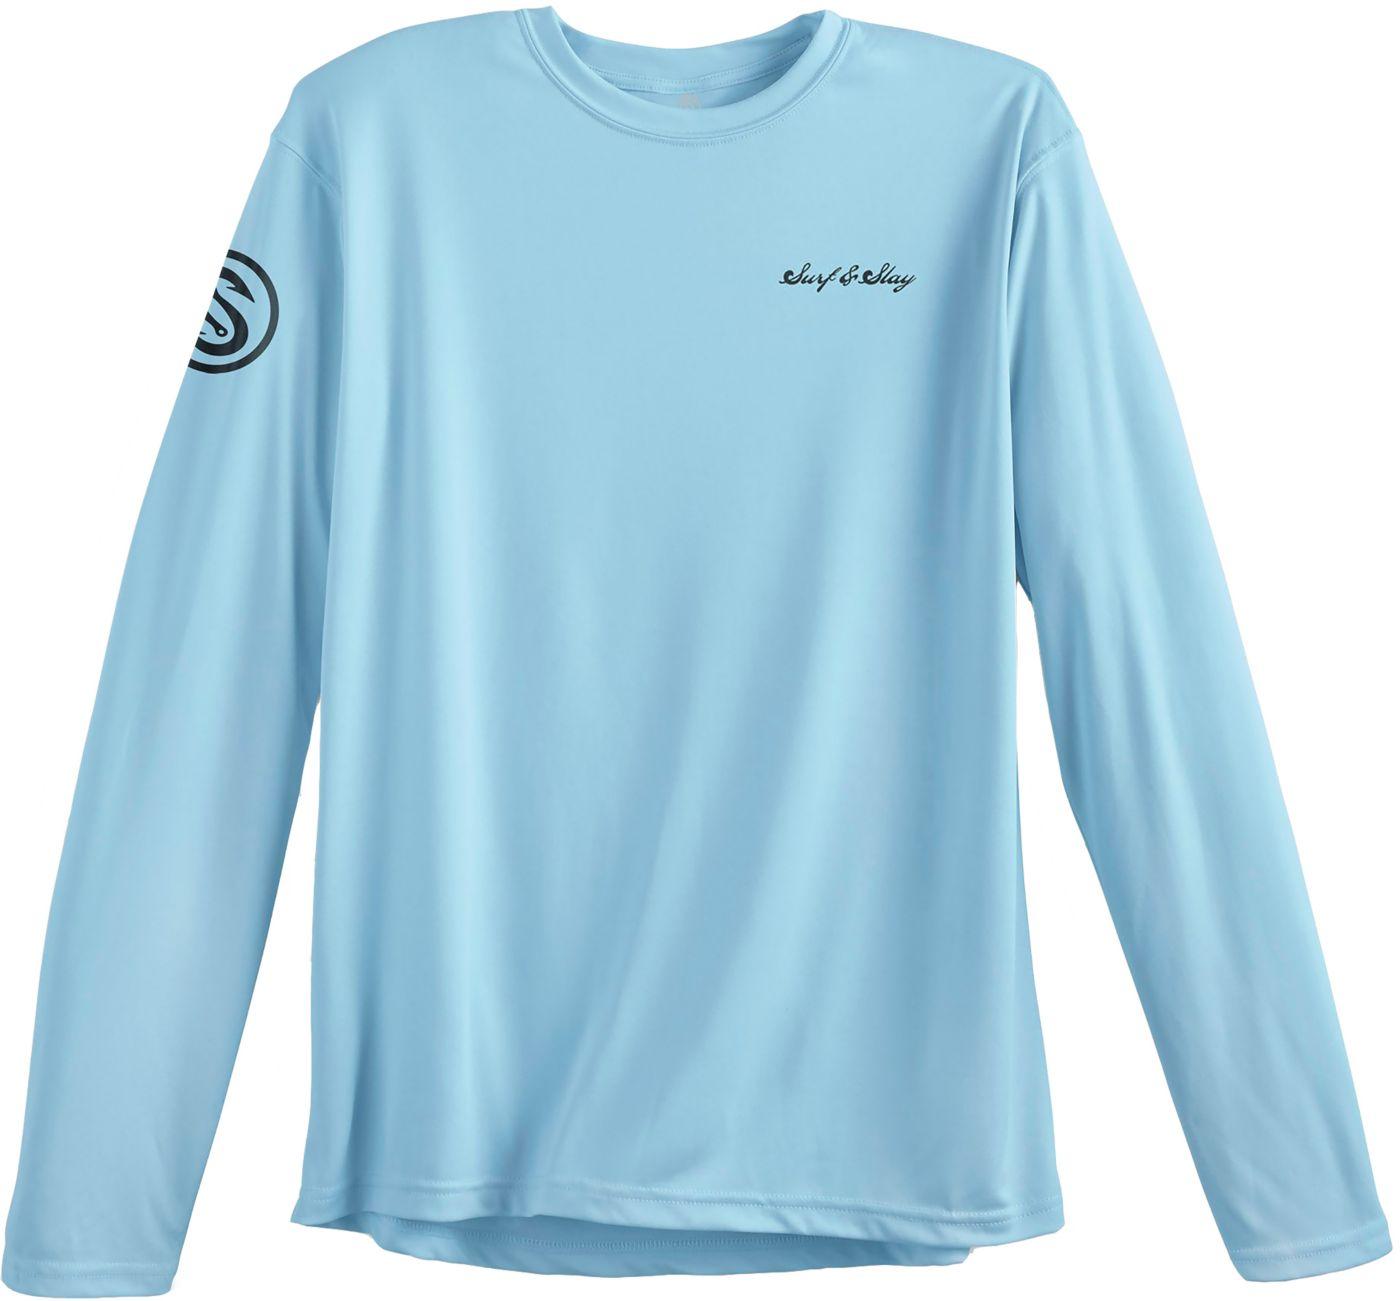 Scales Gear Men's Tuna Slay Long Sleeve Performance Shirt